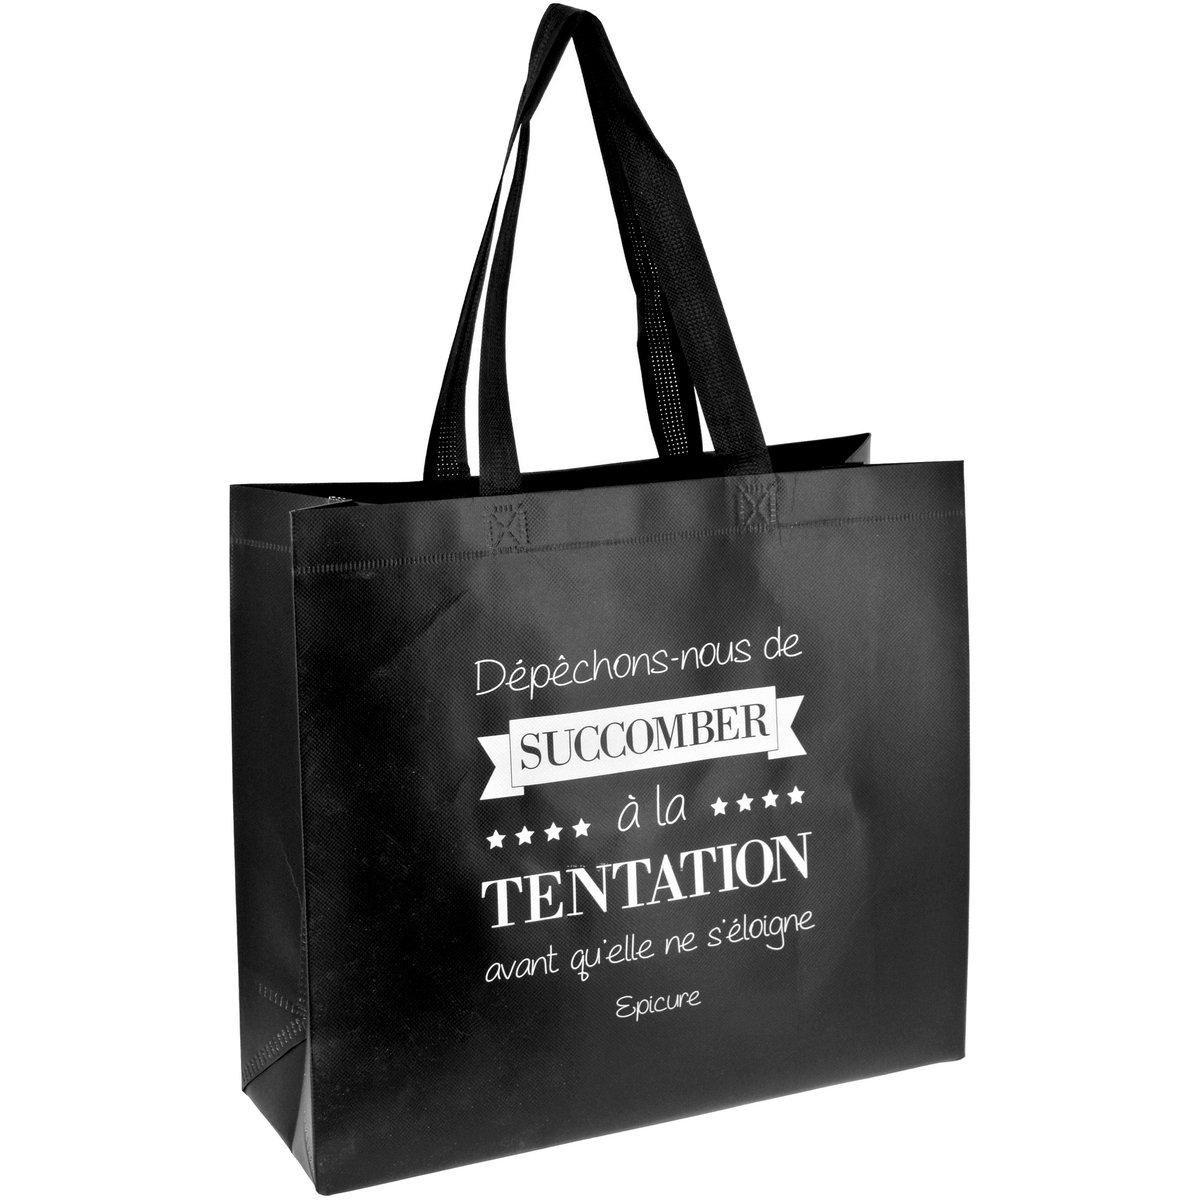 Promobo Sac Pour Course Shopping Cabas Citation Succomber A La Tentation Noir cabsuccomber